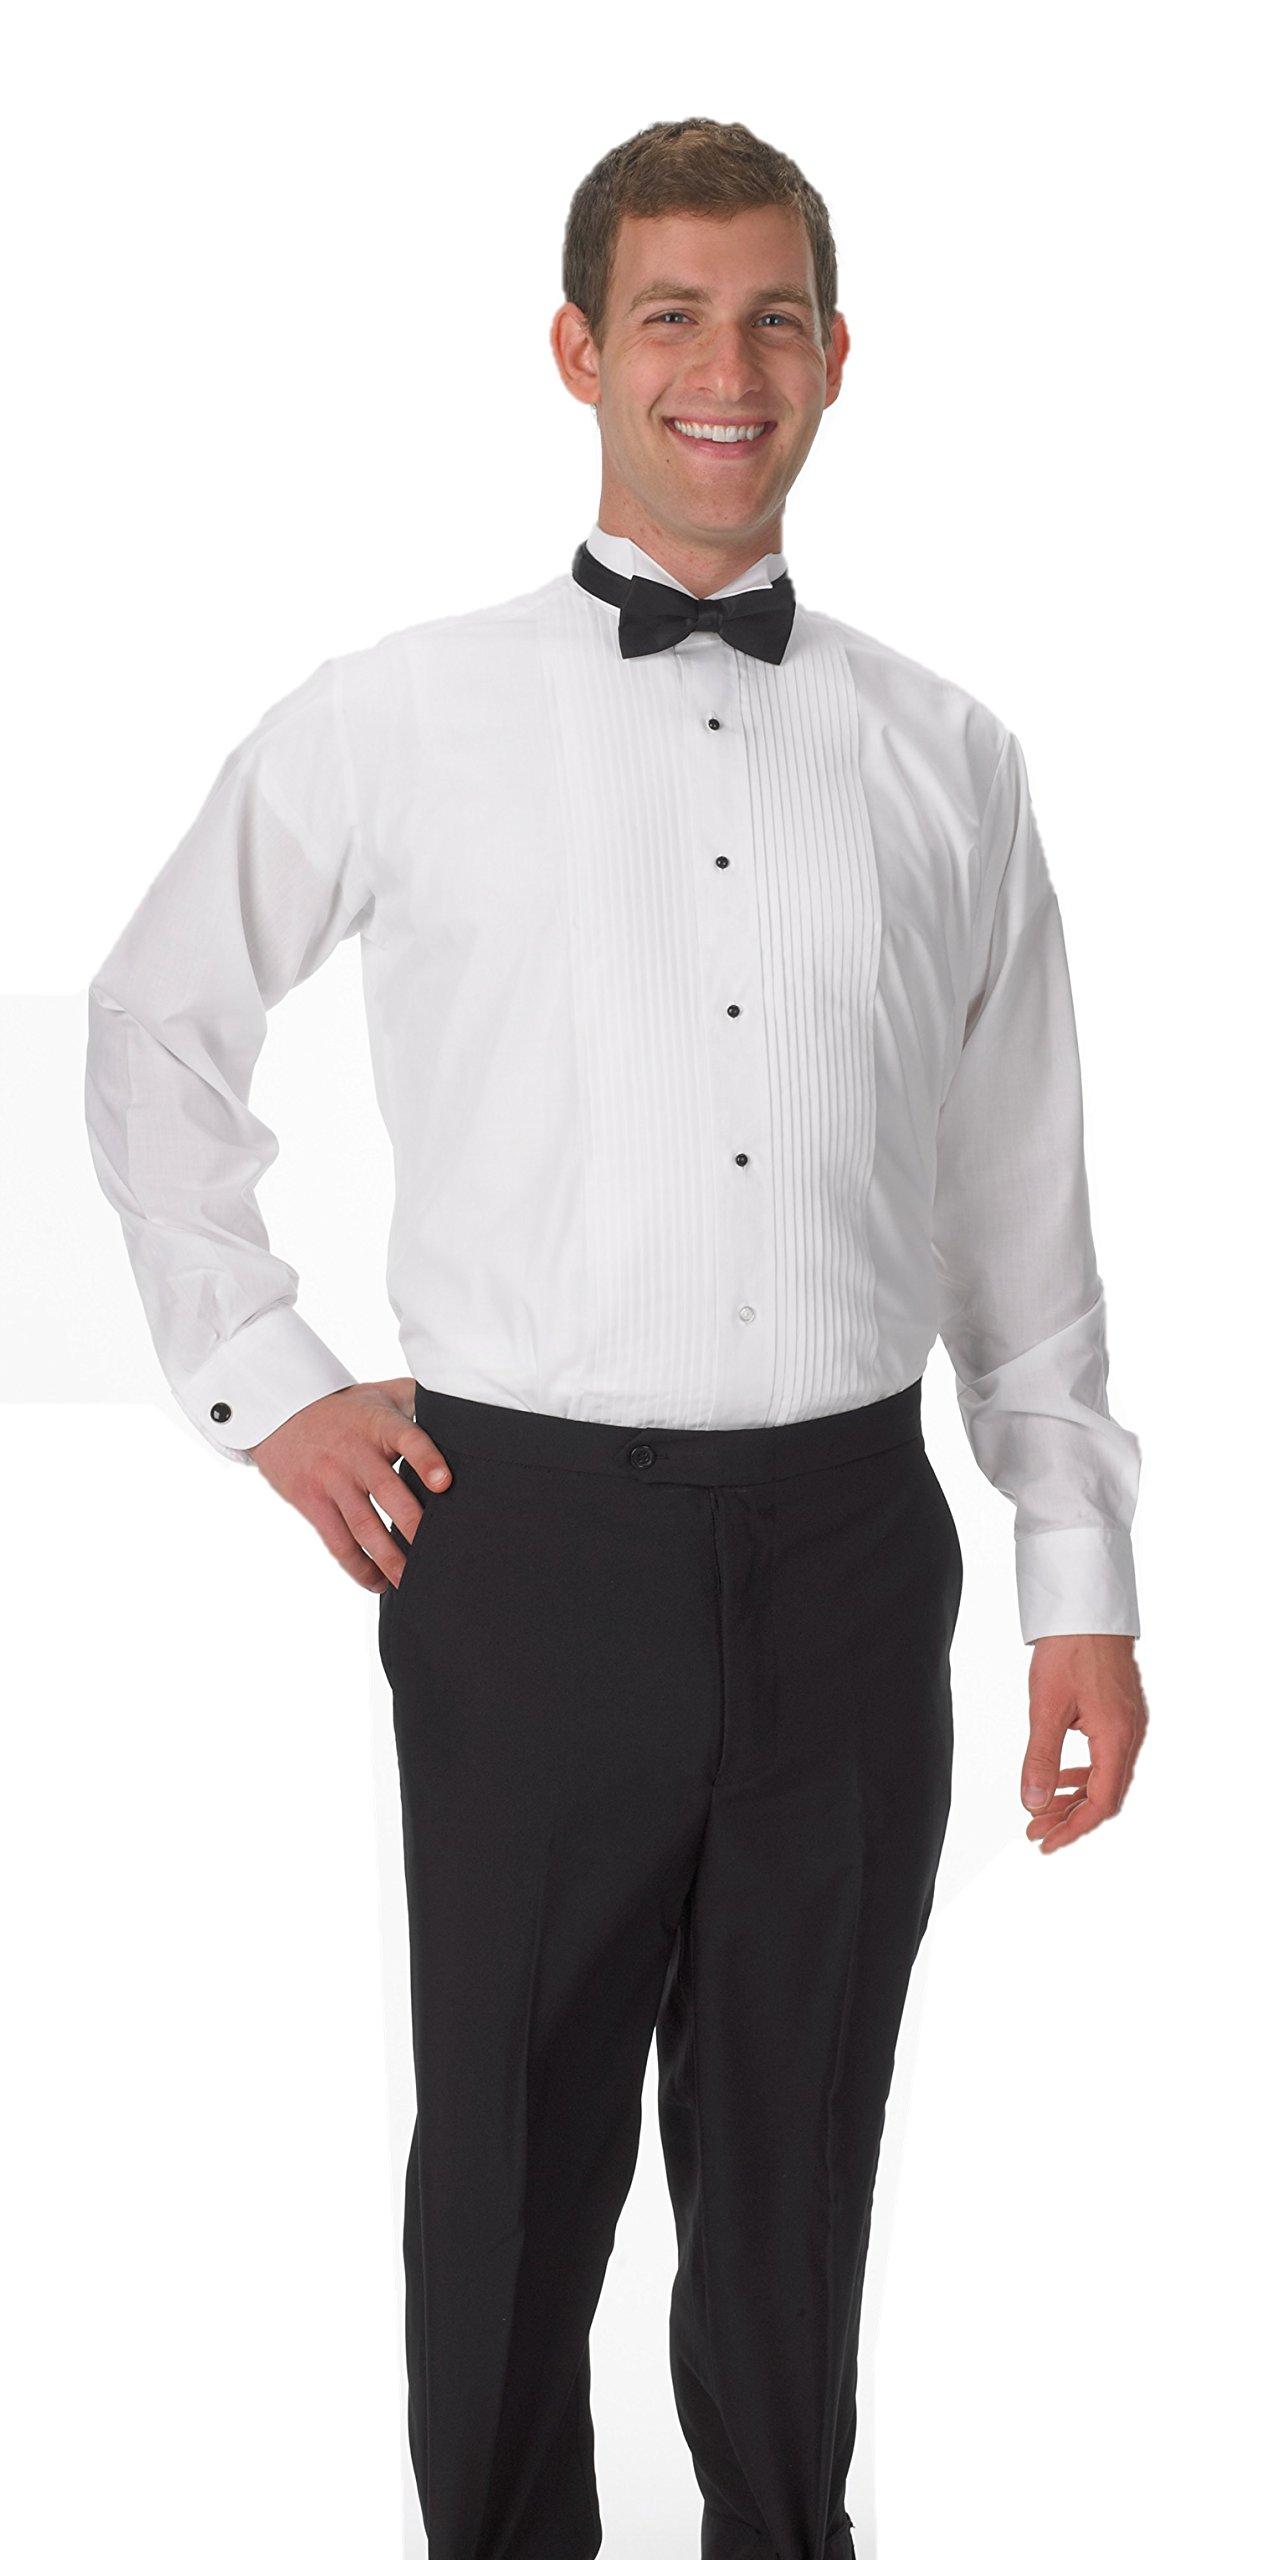 Premium Men's Tuxedo Long Sleeve Shirt Wing-Tip Collar, with Bonus Black Bow Tie - 2XL 34/35